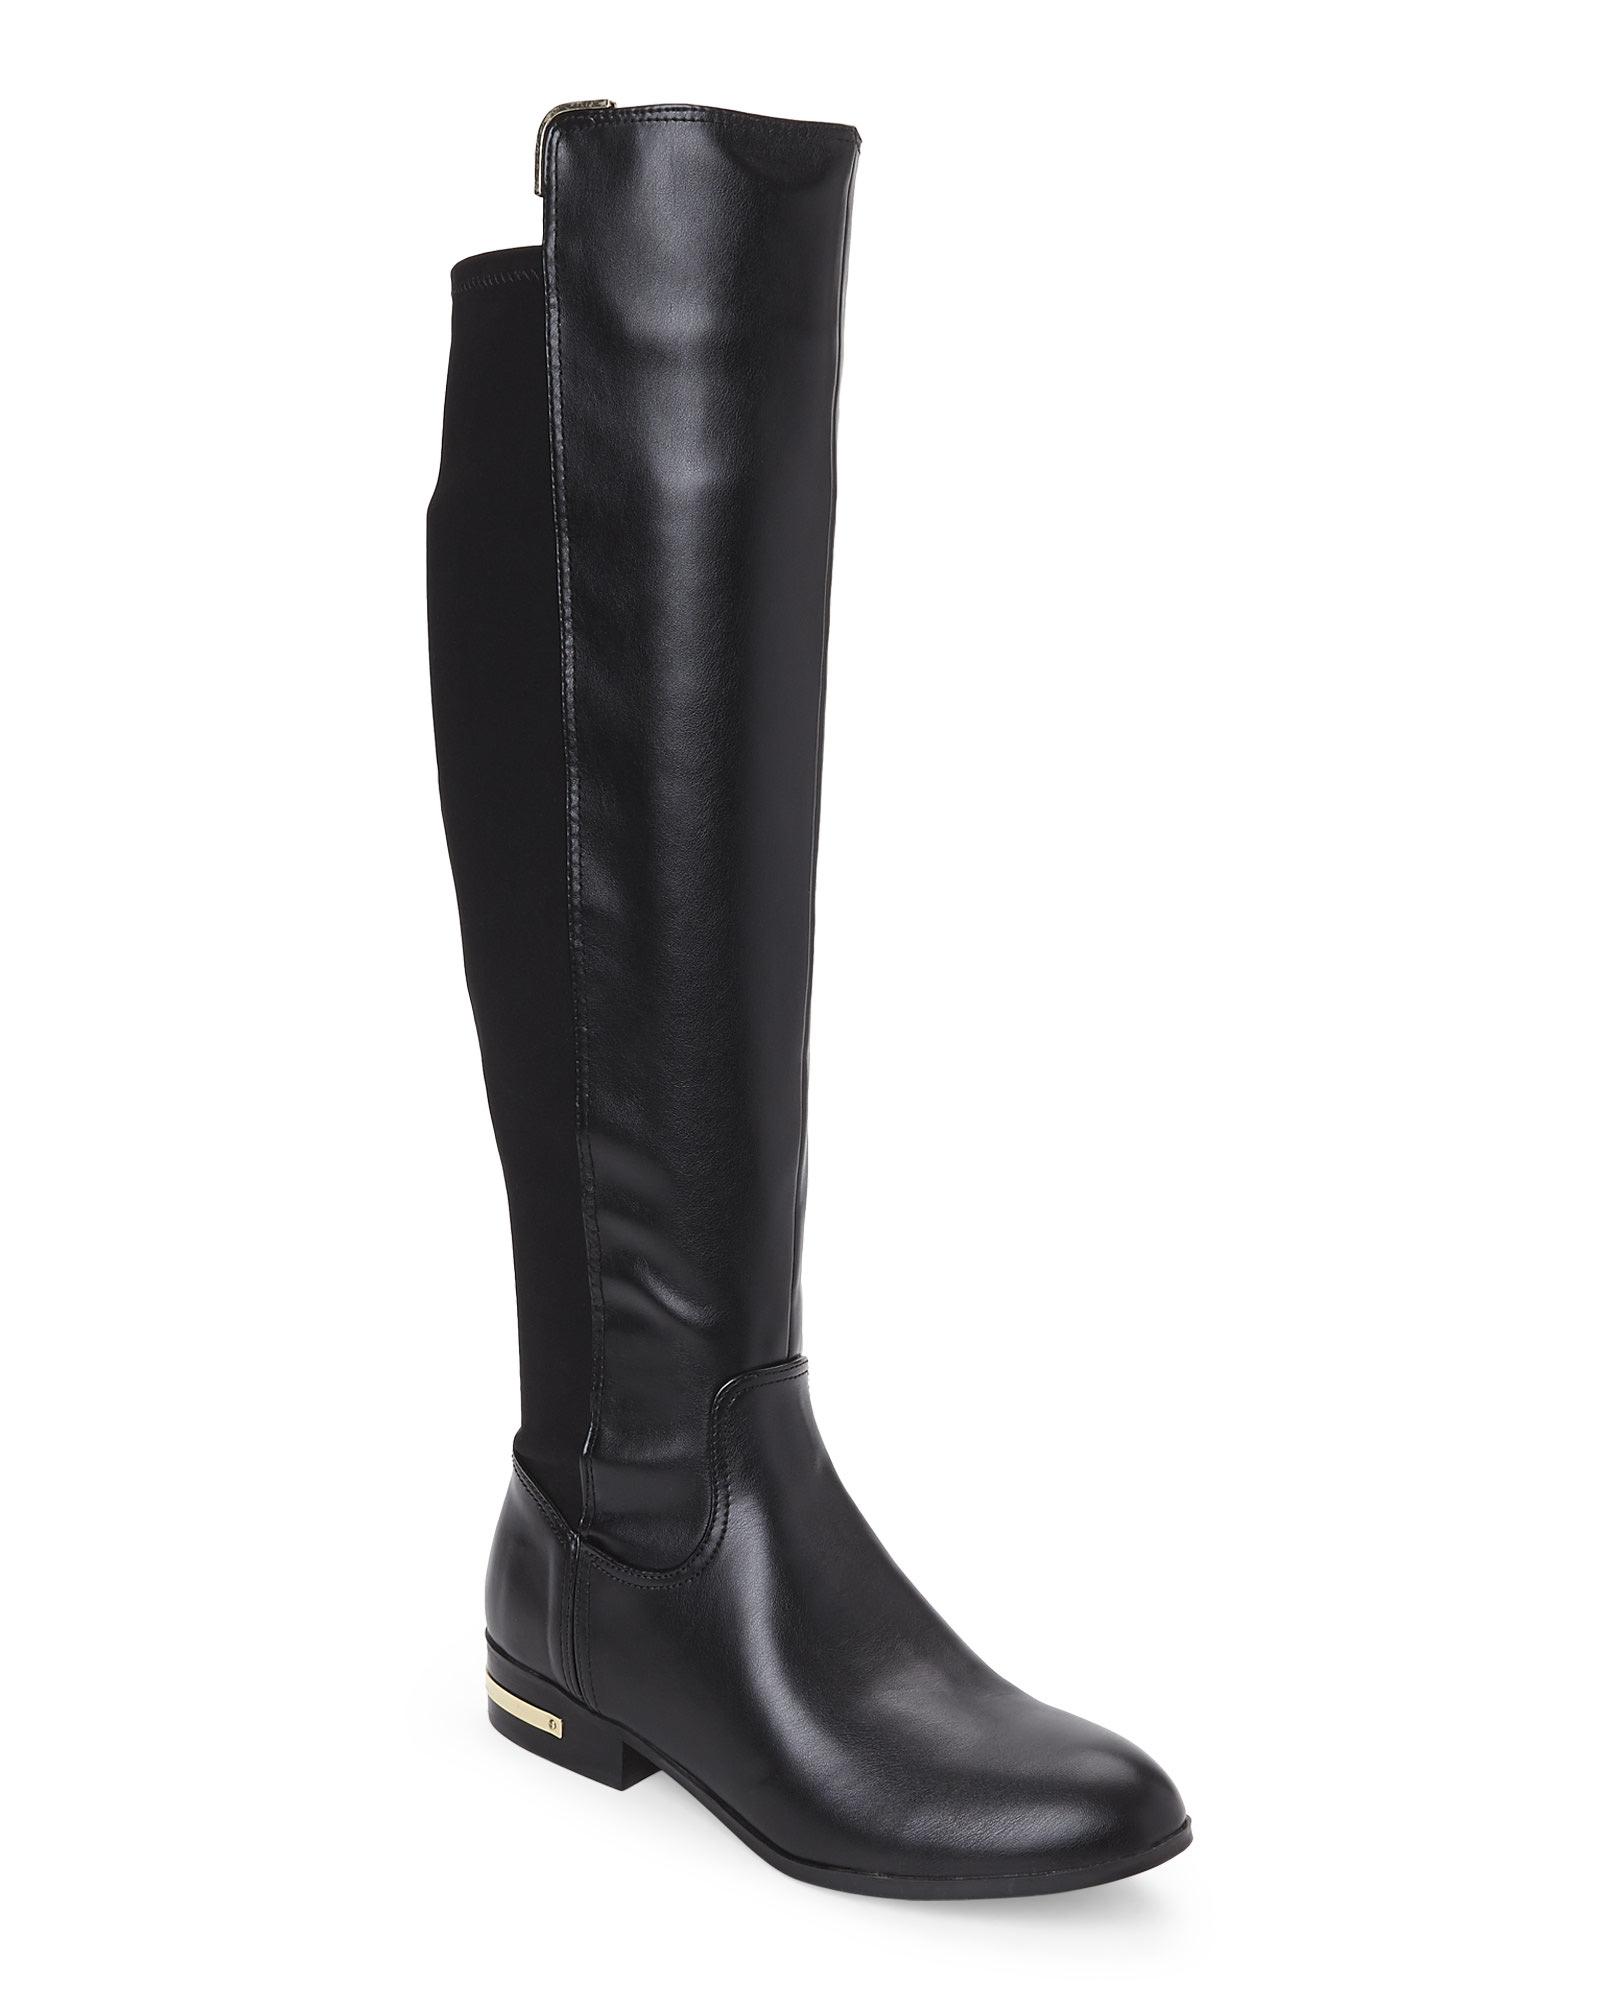 Marc fisher Phoenix Tall Riding Boots in Black | Lyst